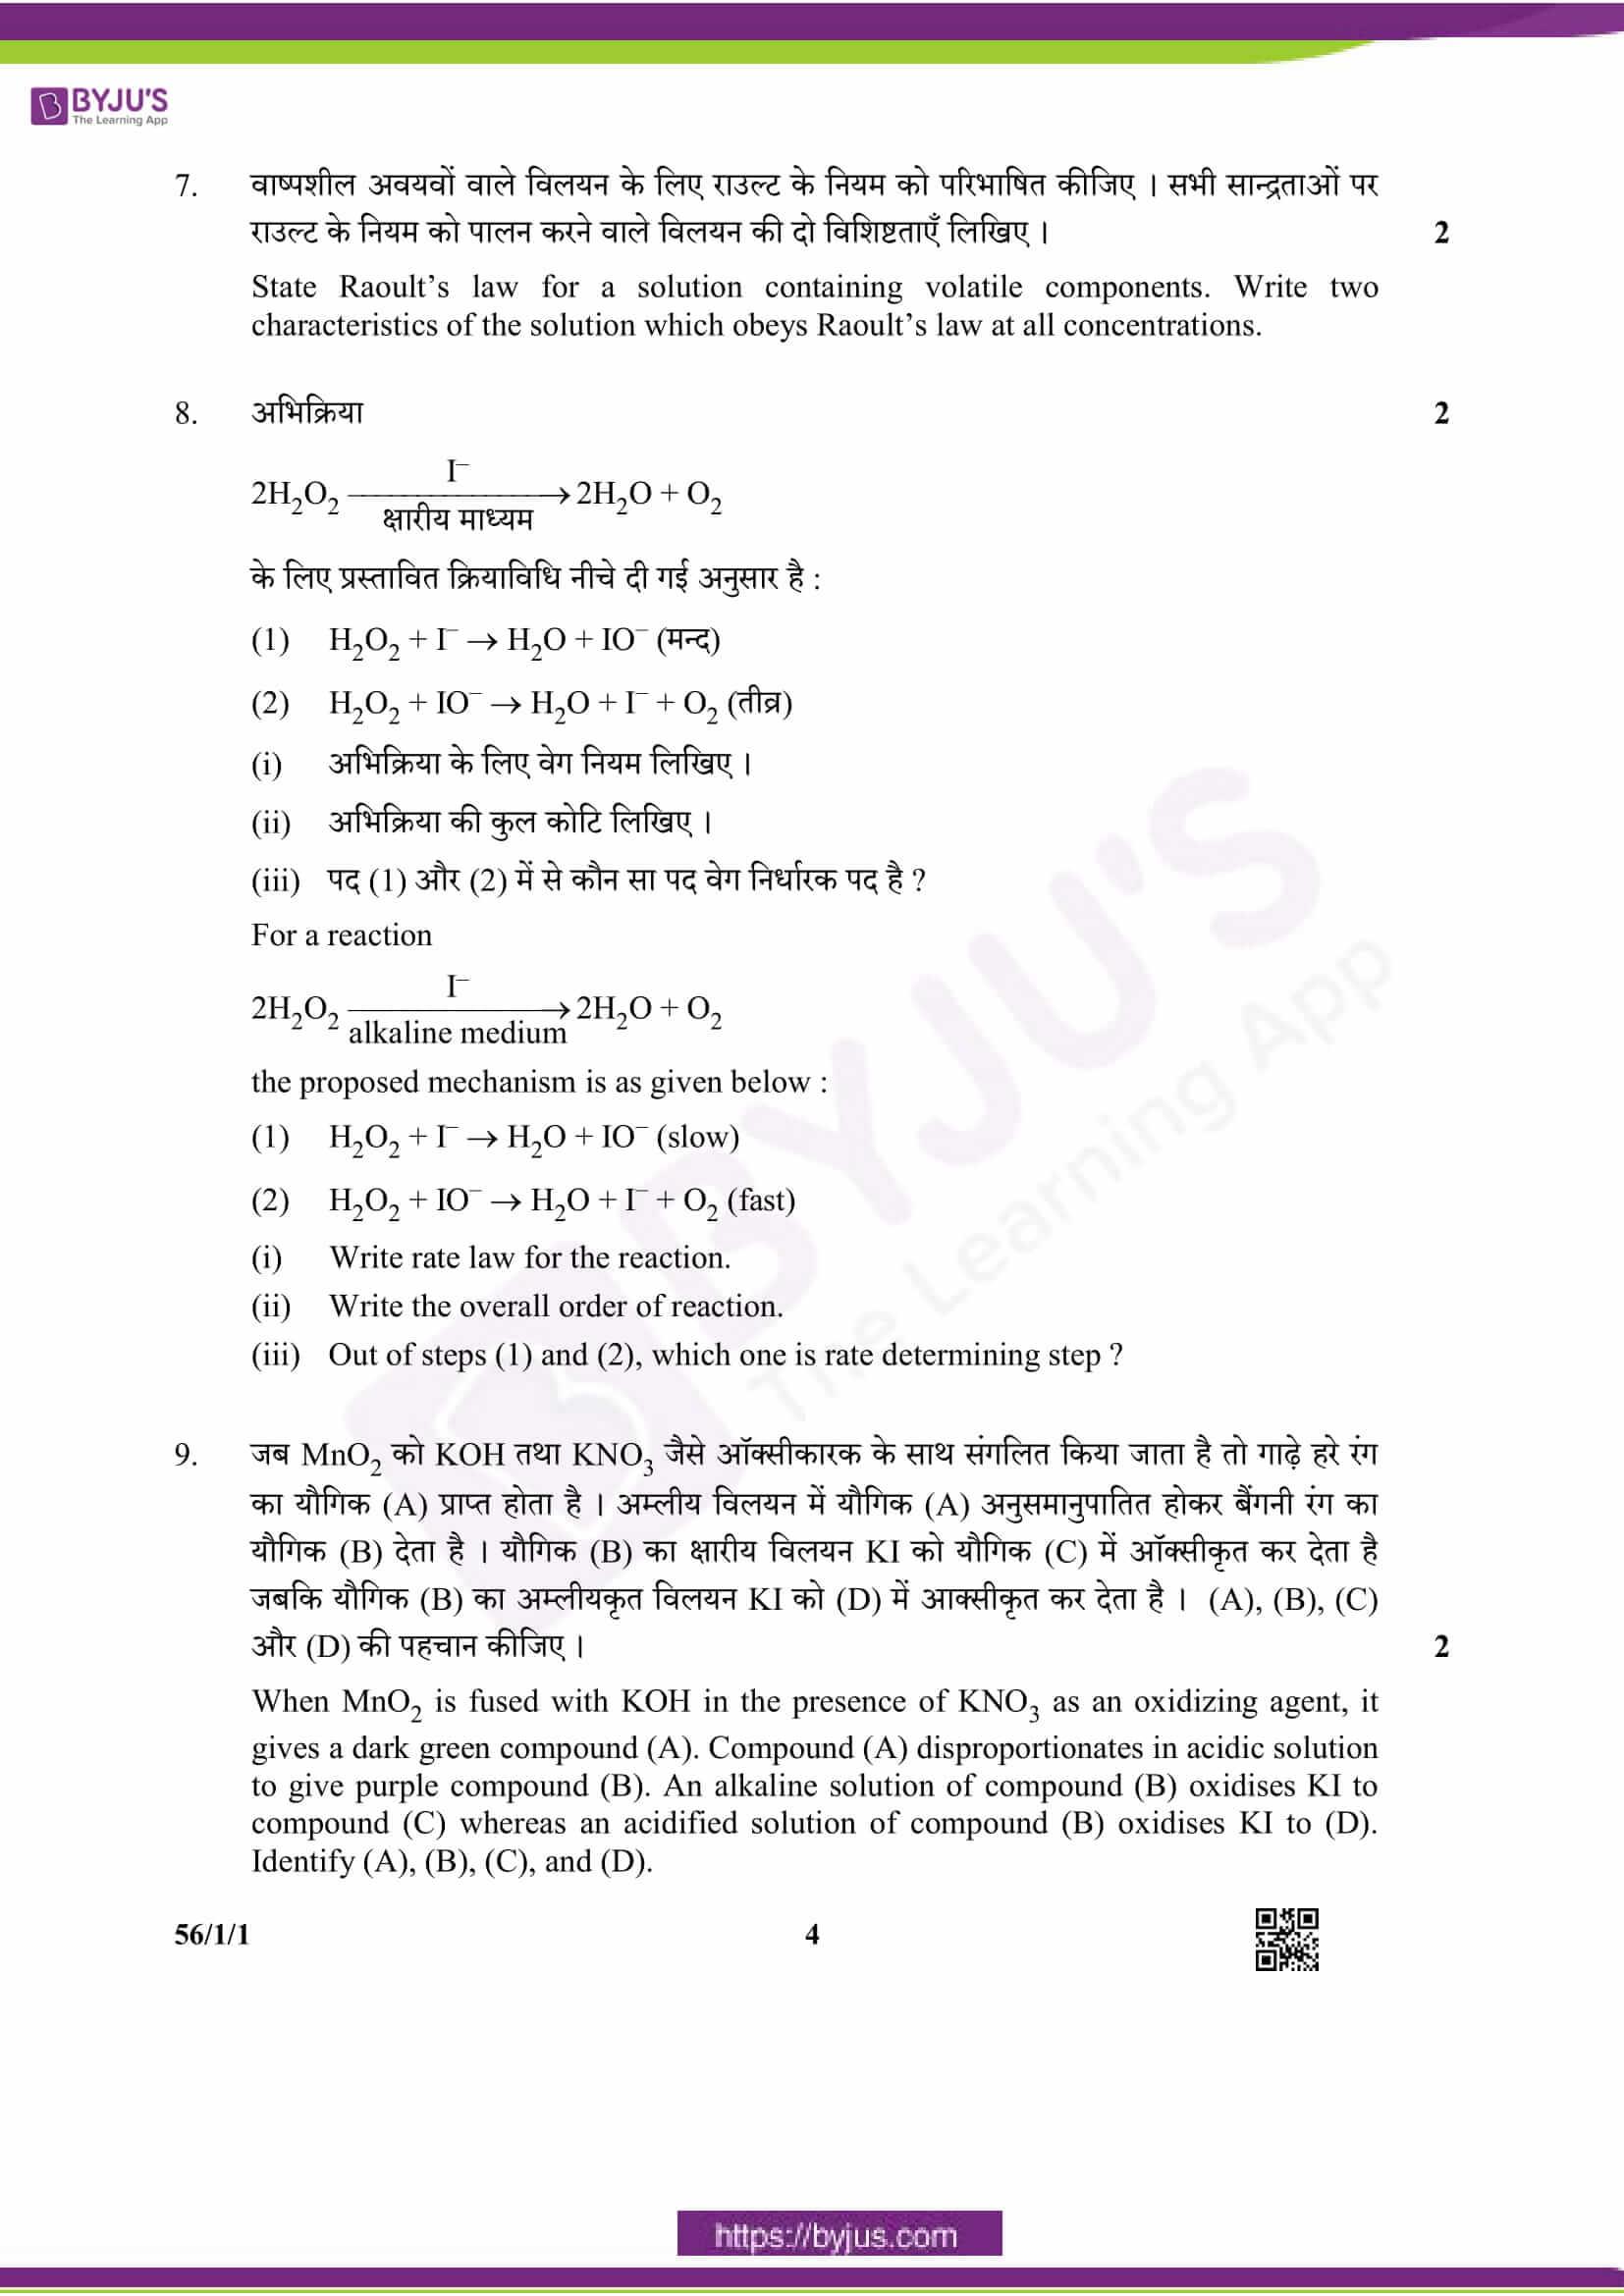 cbse class 12 qs paper 2019 chemistry set 1